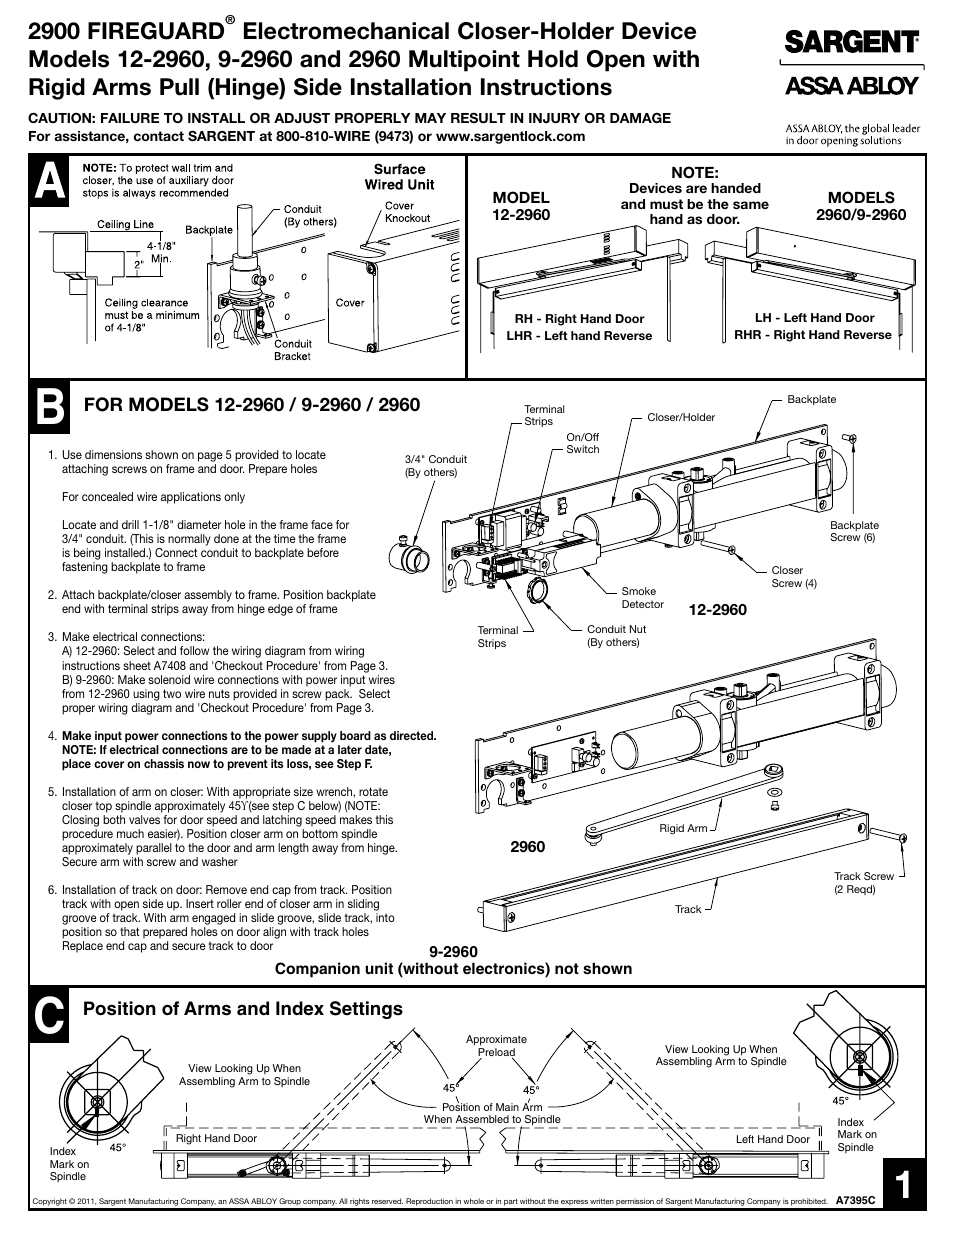 Sargent 8271 Wiring Diagram Electrical Diagrams Commercial Door Forum U2022 Lock